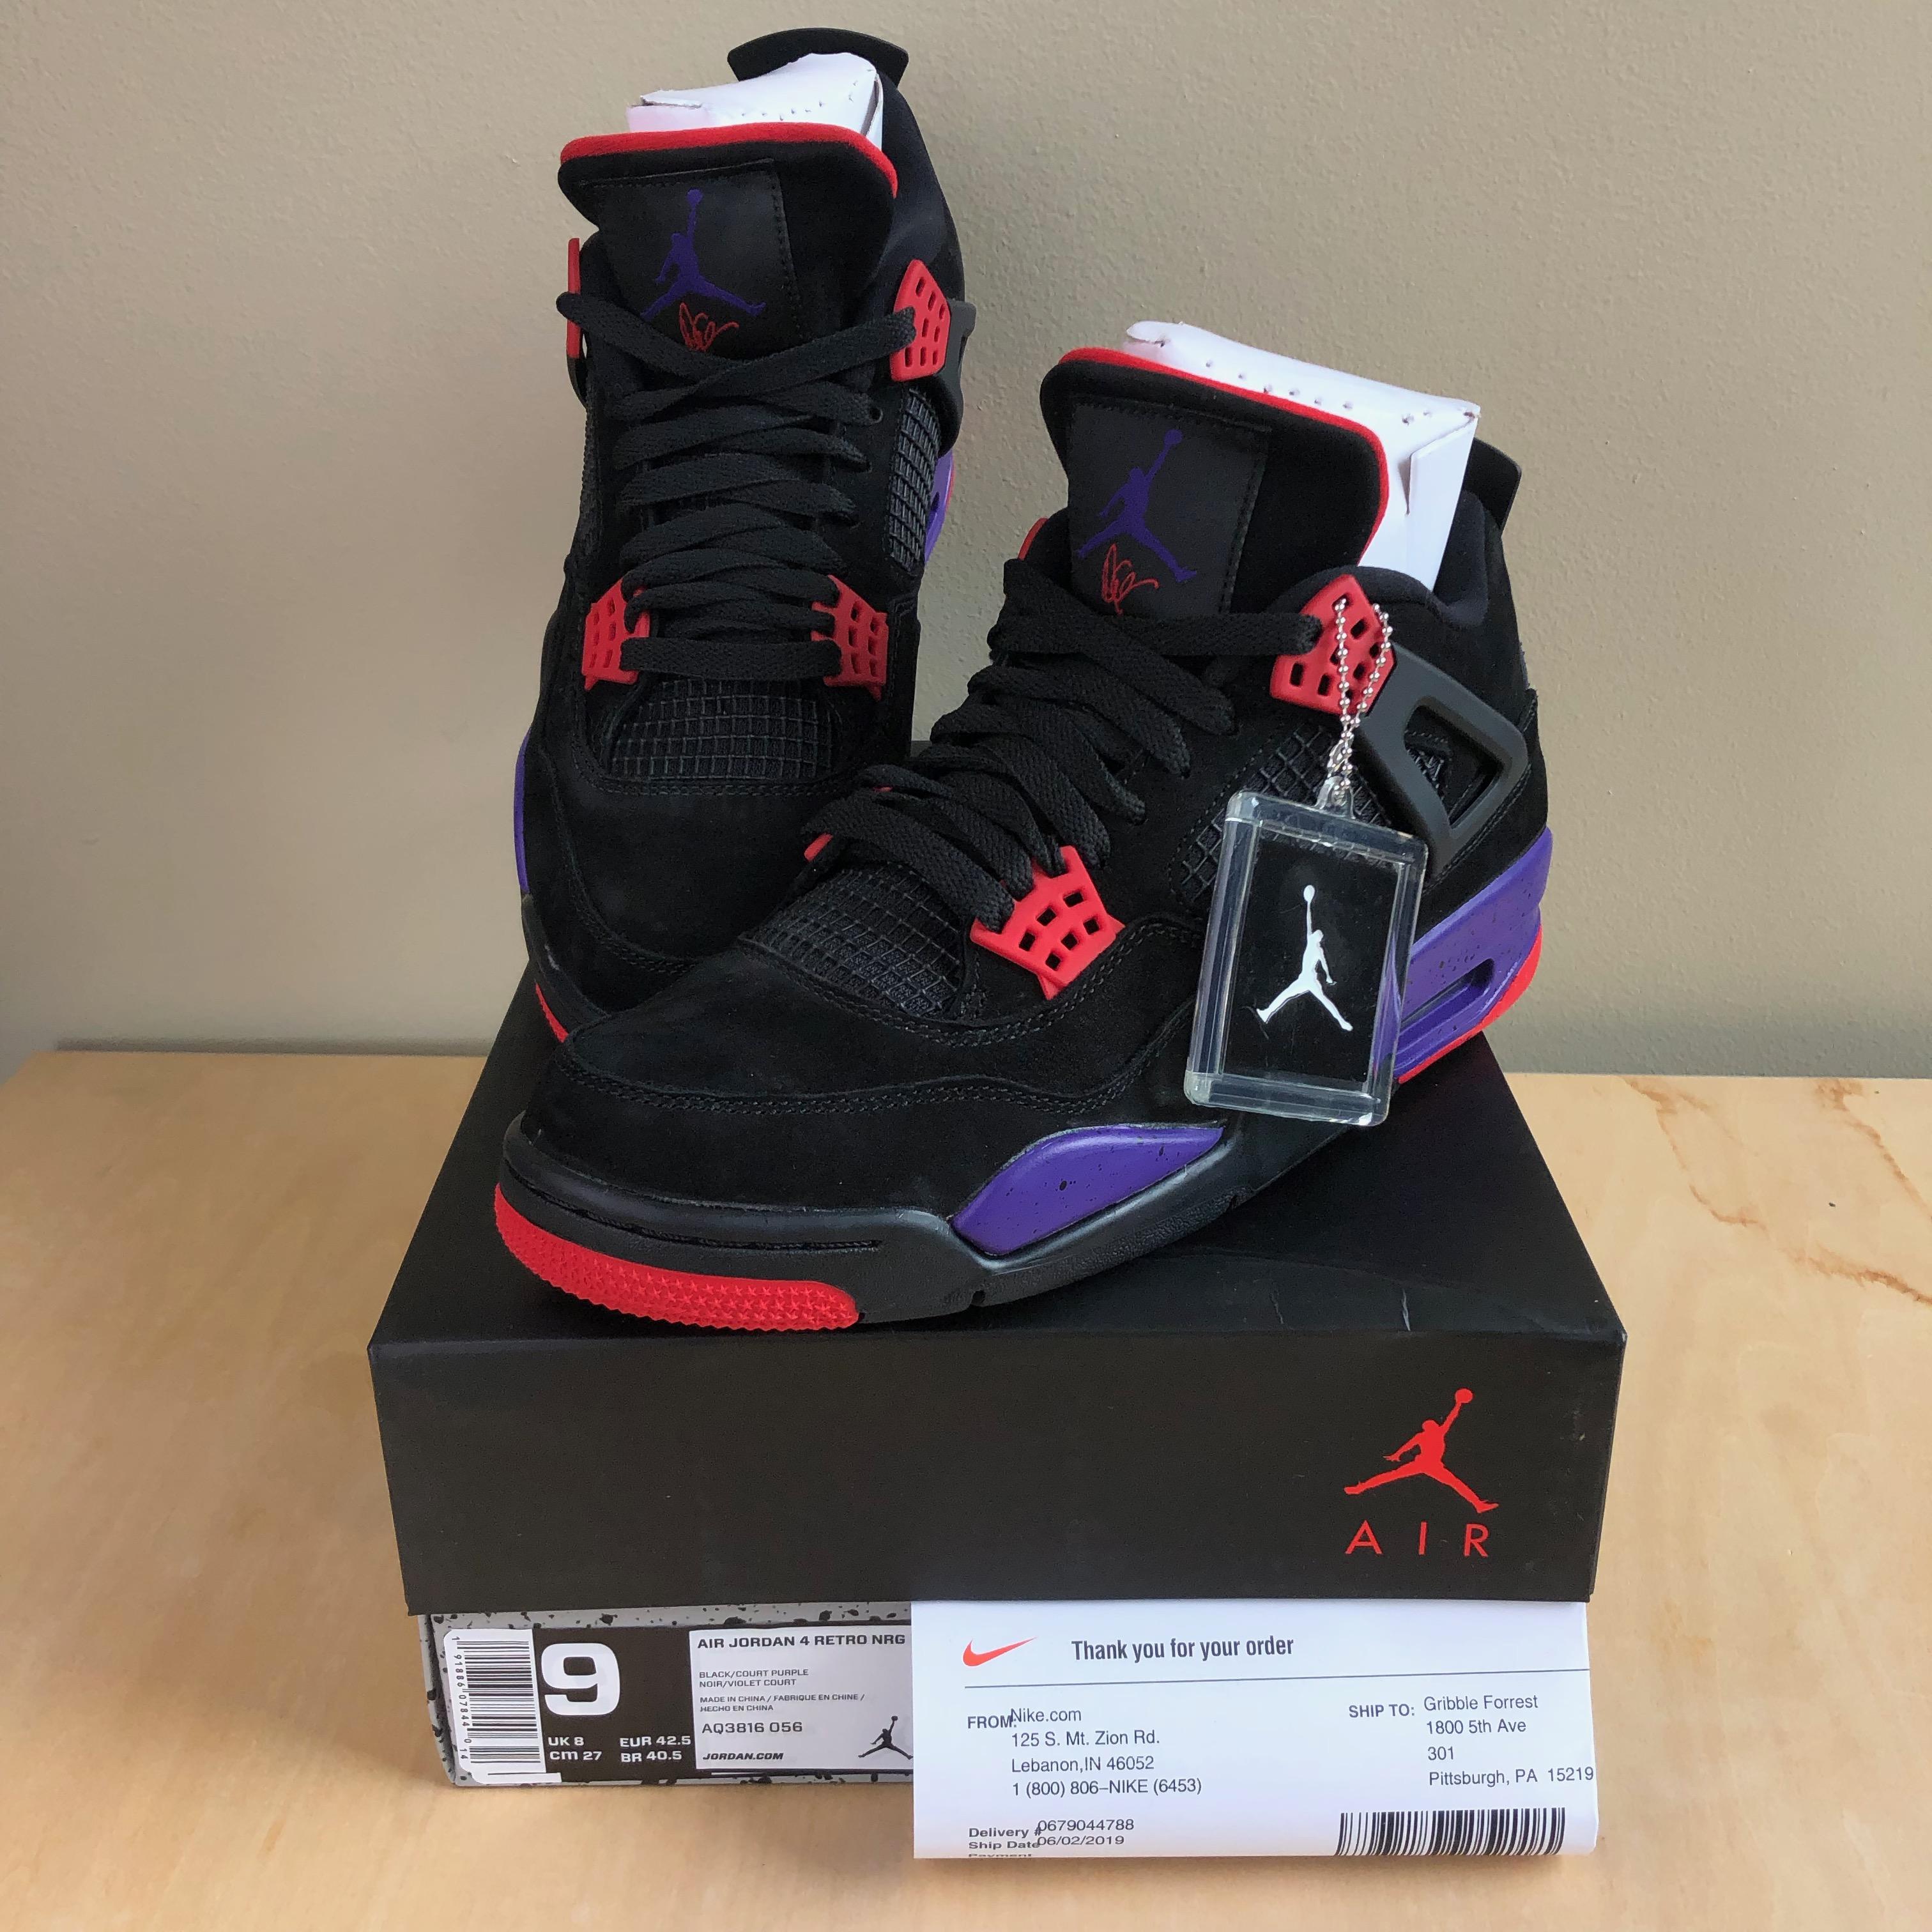 meet 5711b ba720 Nike Air Jordan 4 IV NRG Sz 9 Drake OVO Raptors Black Court Purple  AQ3816-056